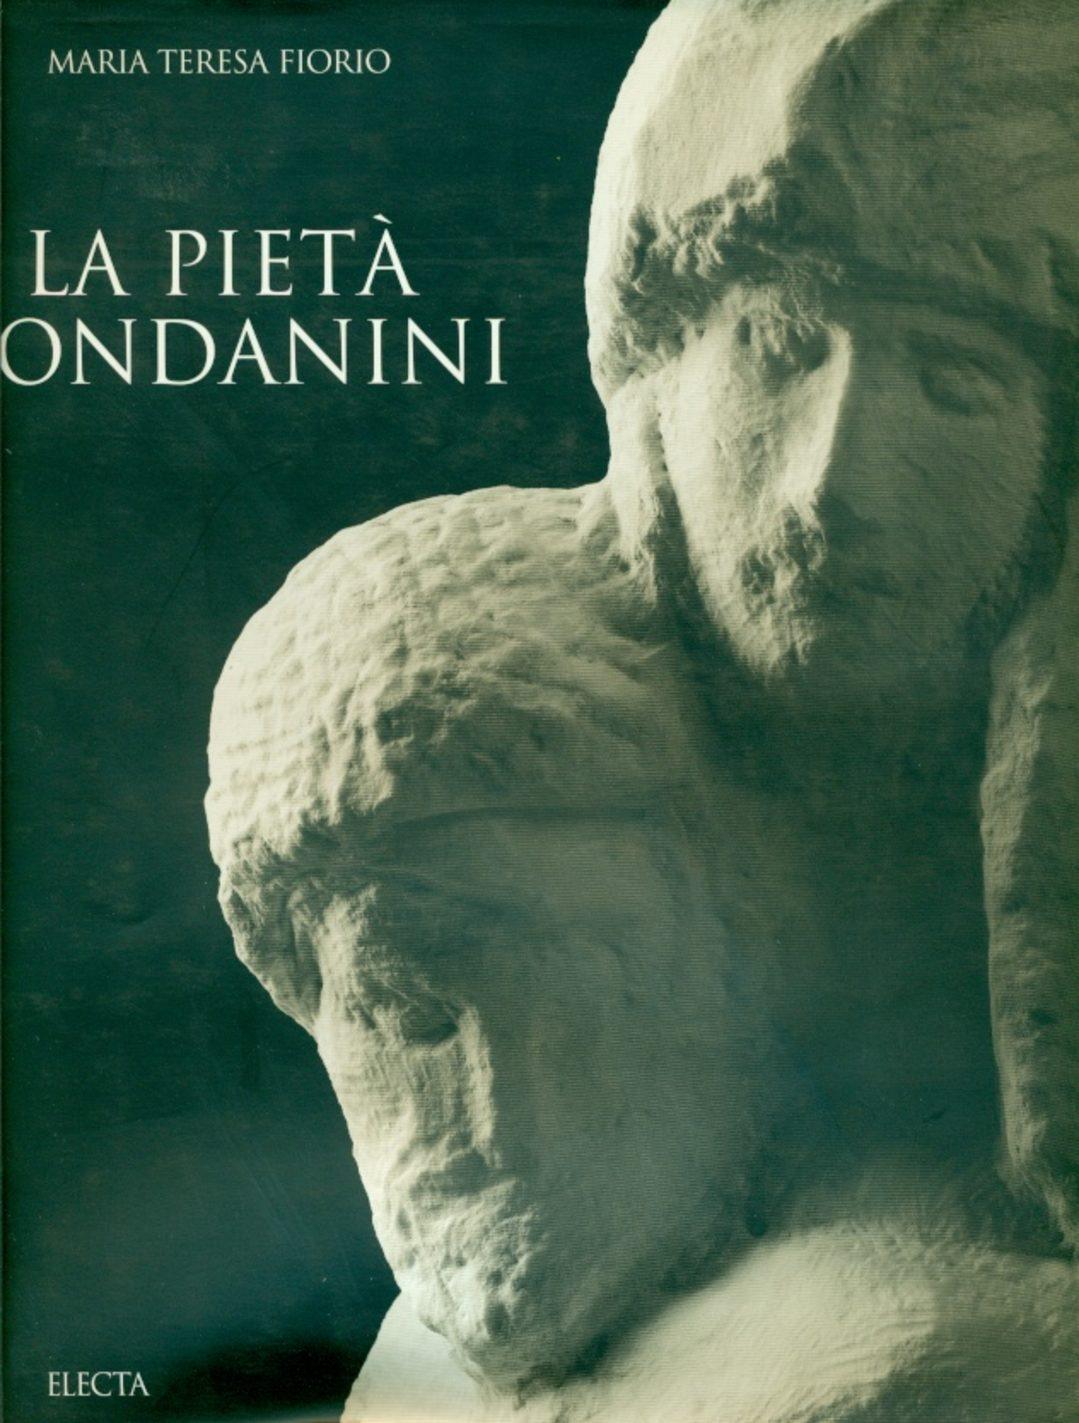 http://cbccoop.it/app/uploads/2017/06/M.Fiorio-PIETA-Rondanini-Vedovello.-pdf.jpg